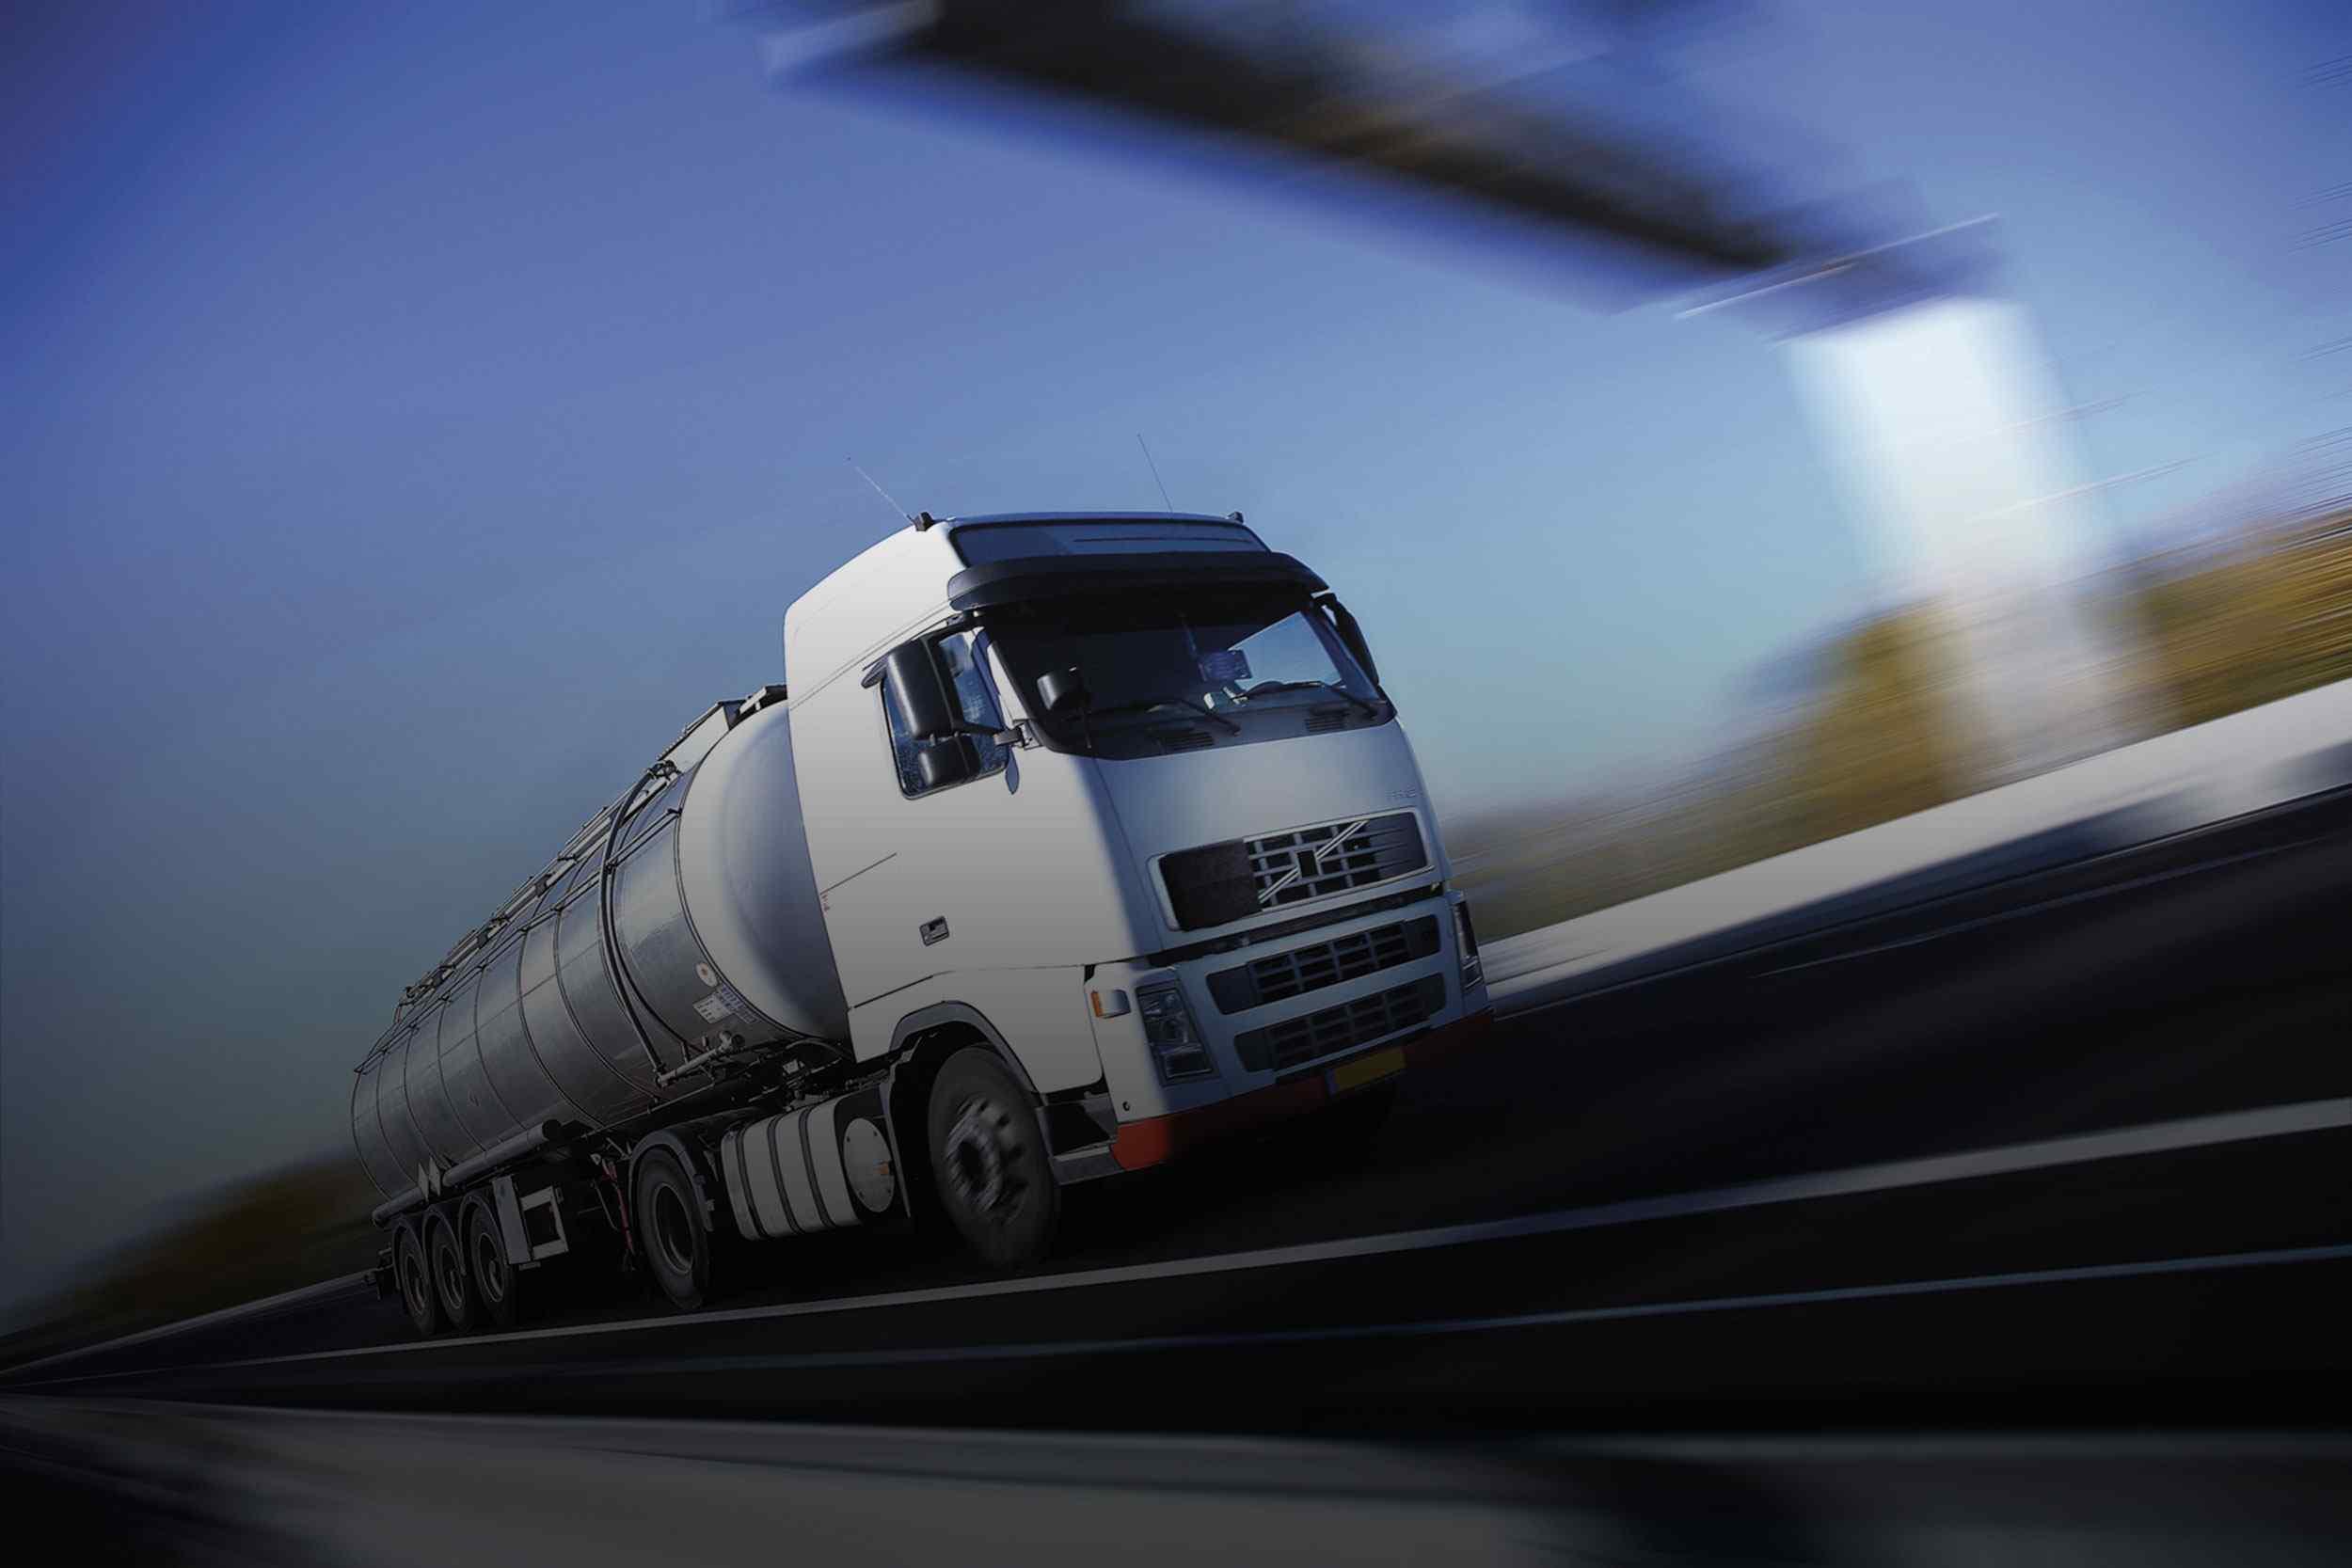 https://www.gamaas.com.tr/wp-content/uploads/2015/09/White-Truck-single.jpg